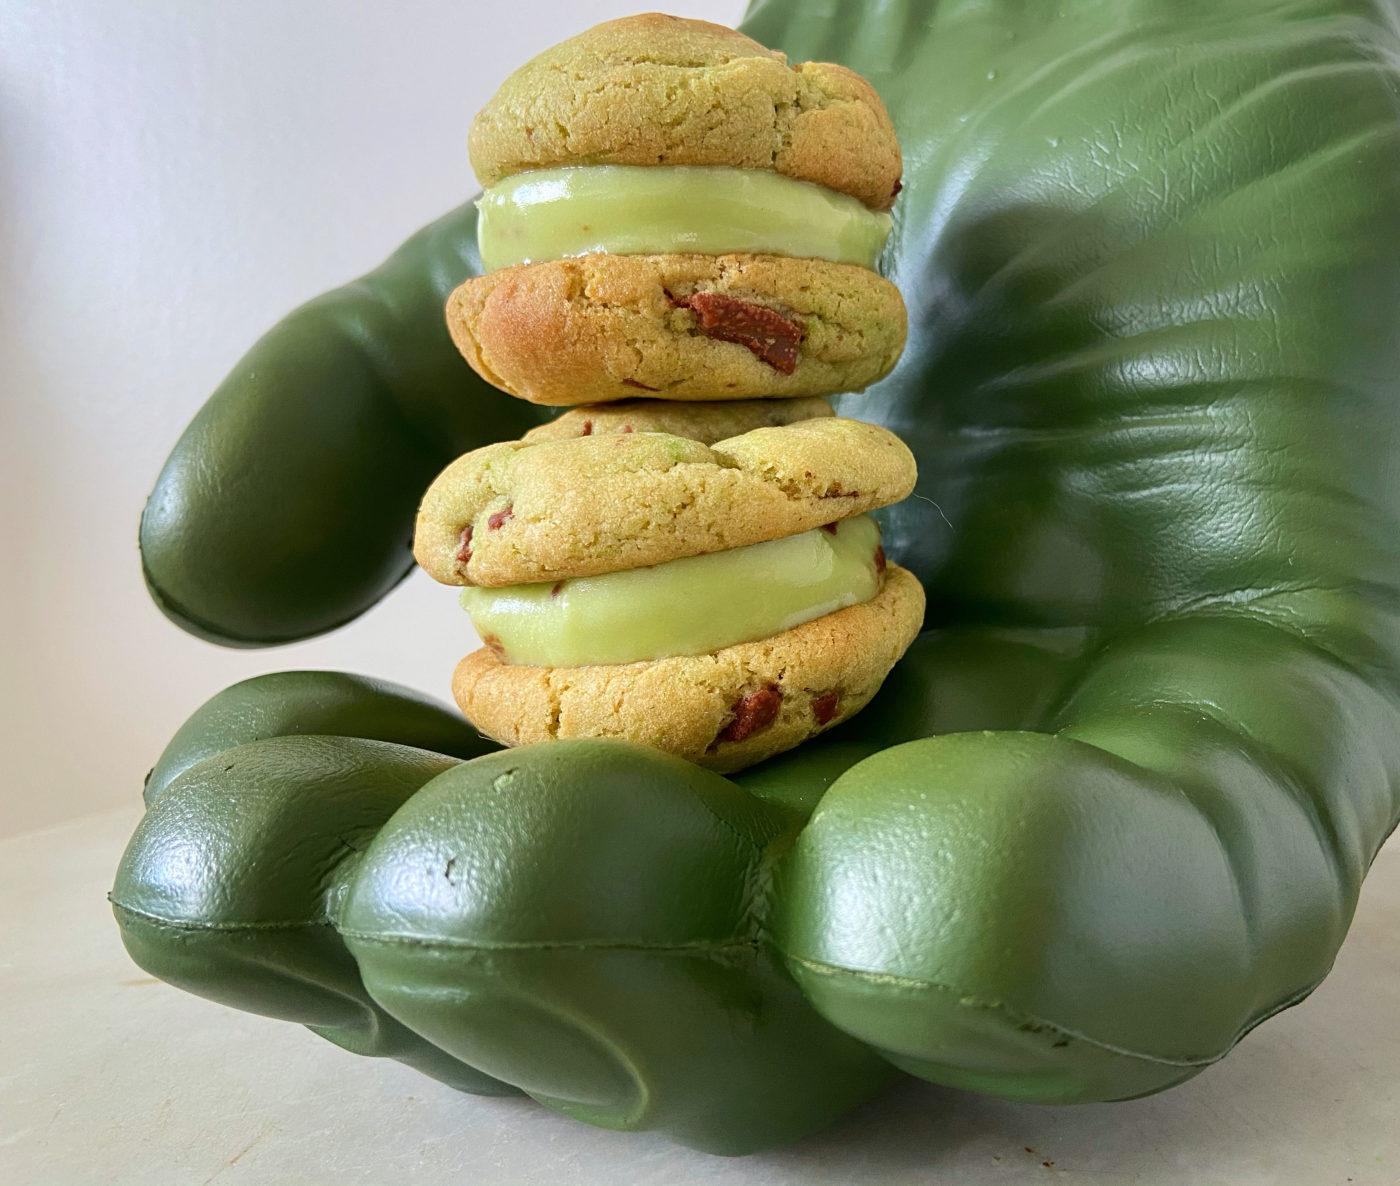 Hunka Hulka Burning Fudge ice cream sandwiches